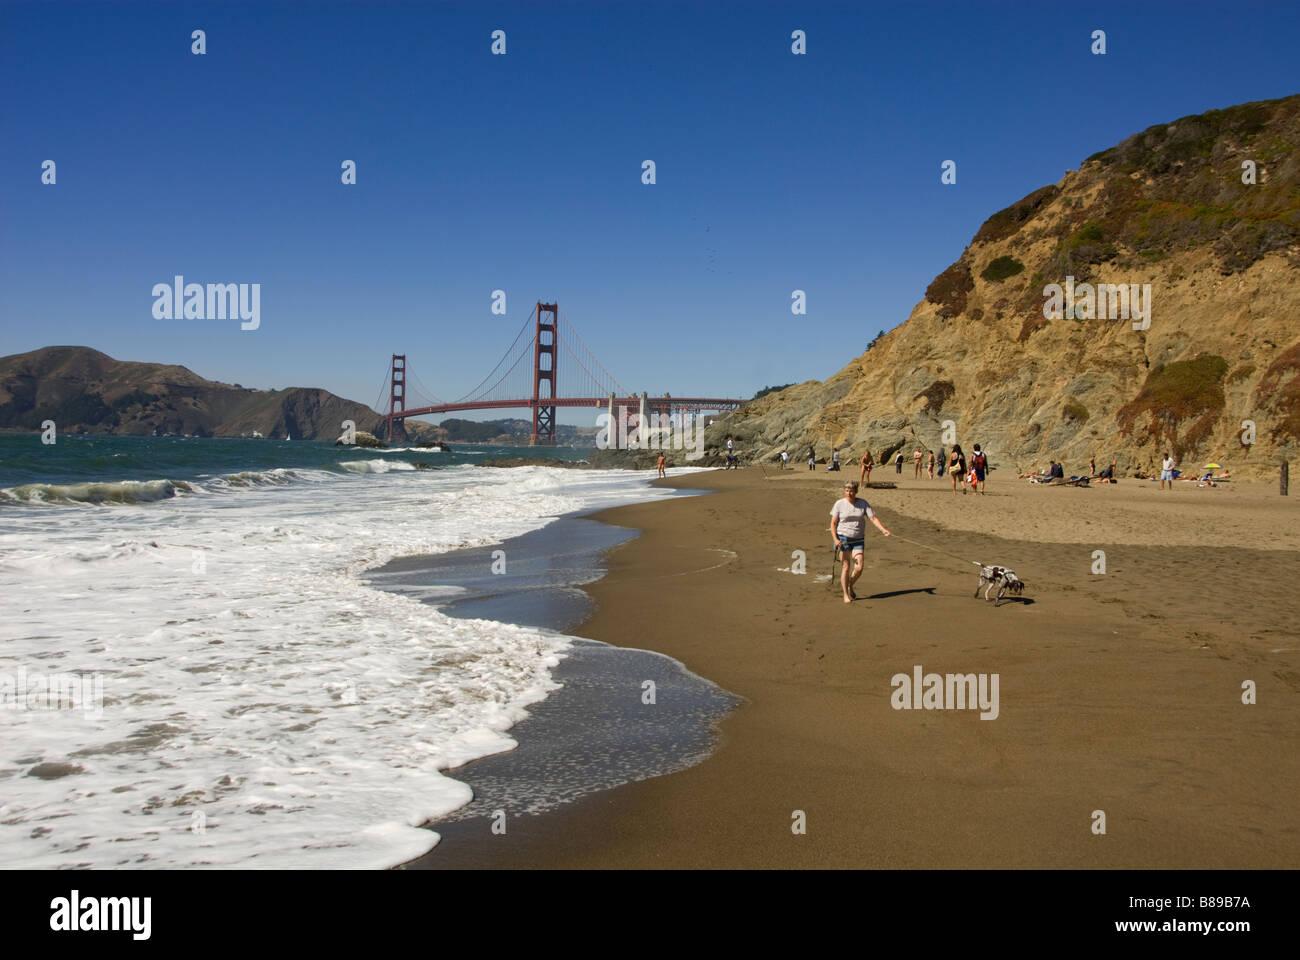 San Francisco Baker Beach with Golden Gate Bridge in background Photo 2 casanf83352 Photo copyright Lee Foster - Stock Image